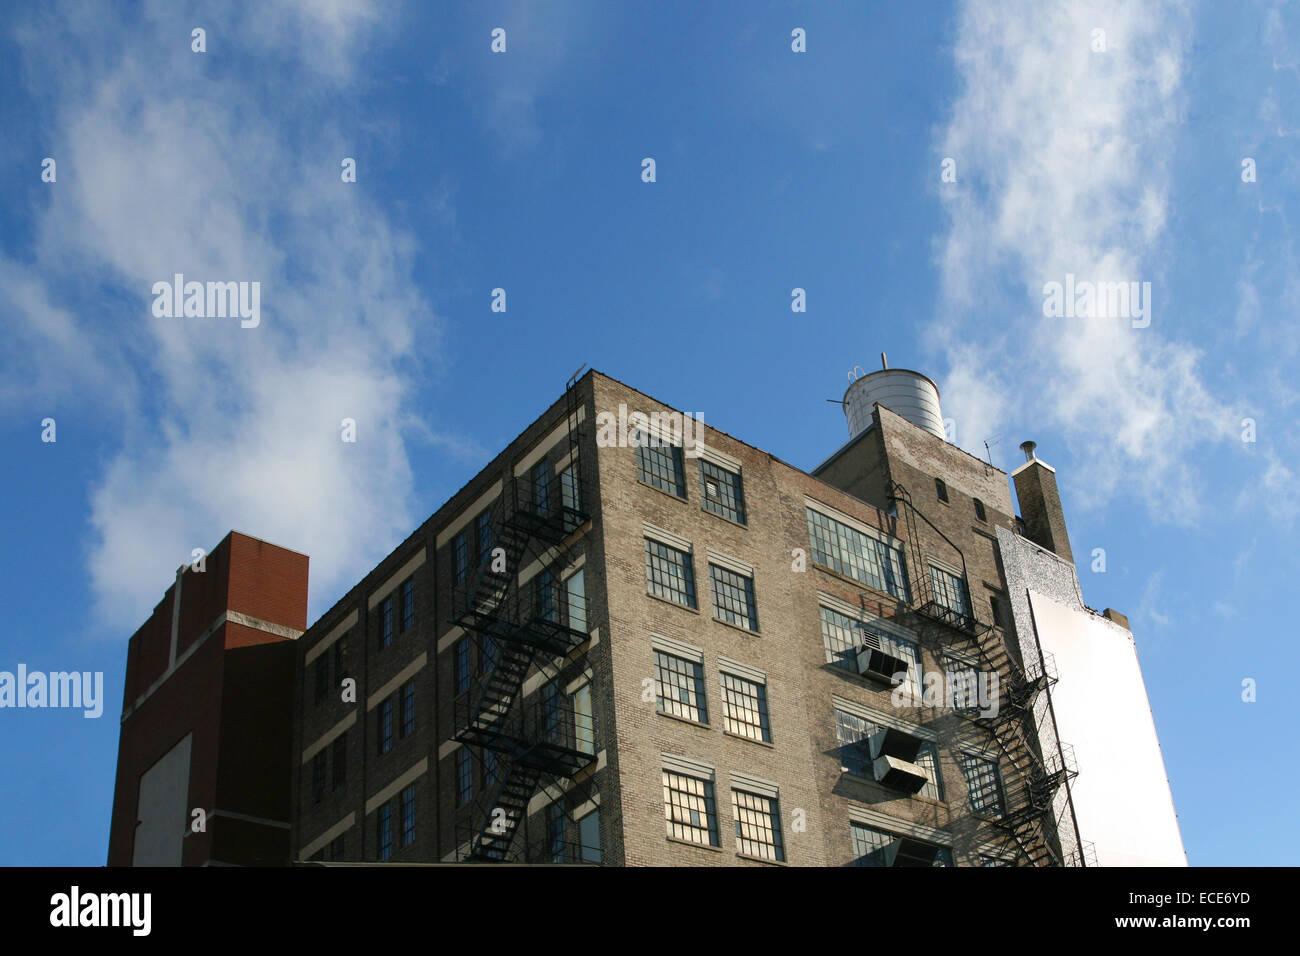 Backstein Gebaeude Feuerleiter Ziegel Alt Himmel Freiraum Frei Blau Industrie Haus Haeuser Fenster Bruechig Bruechiges Stockbild